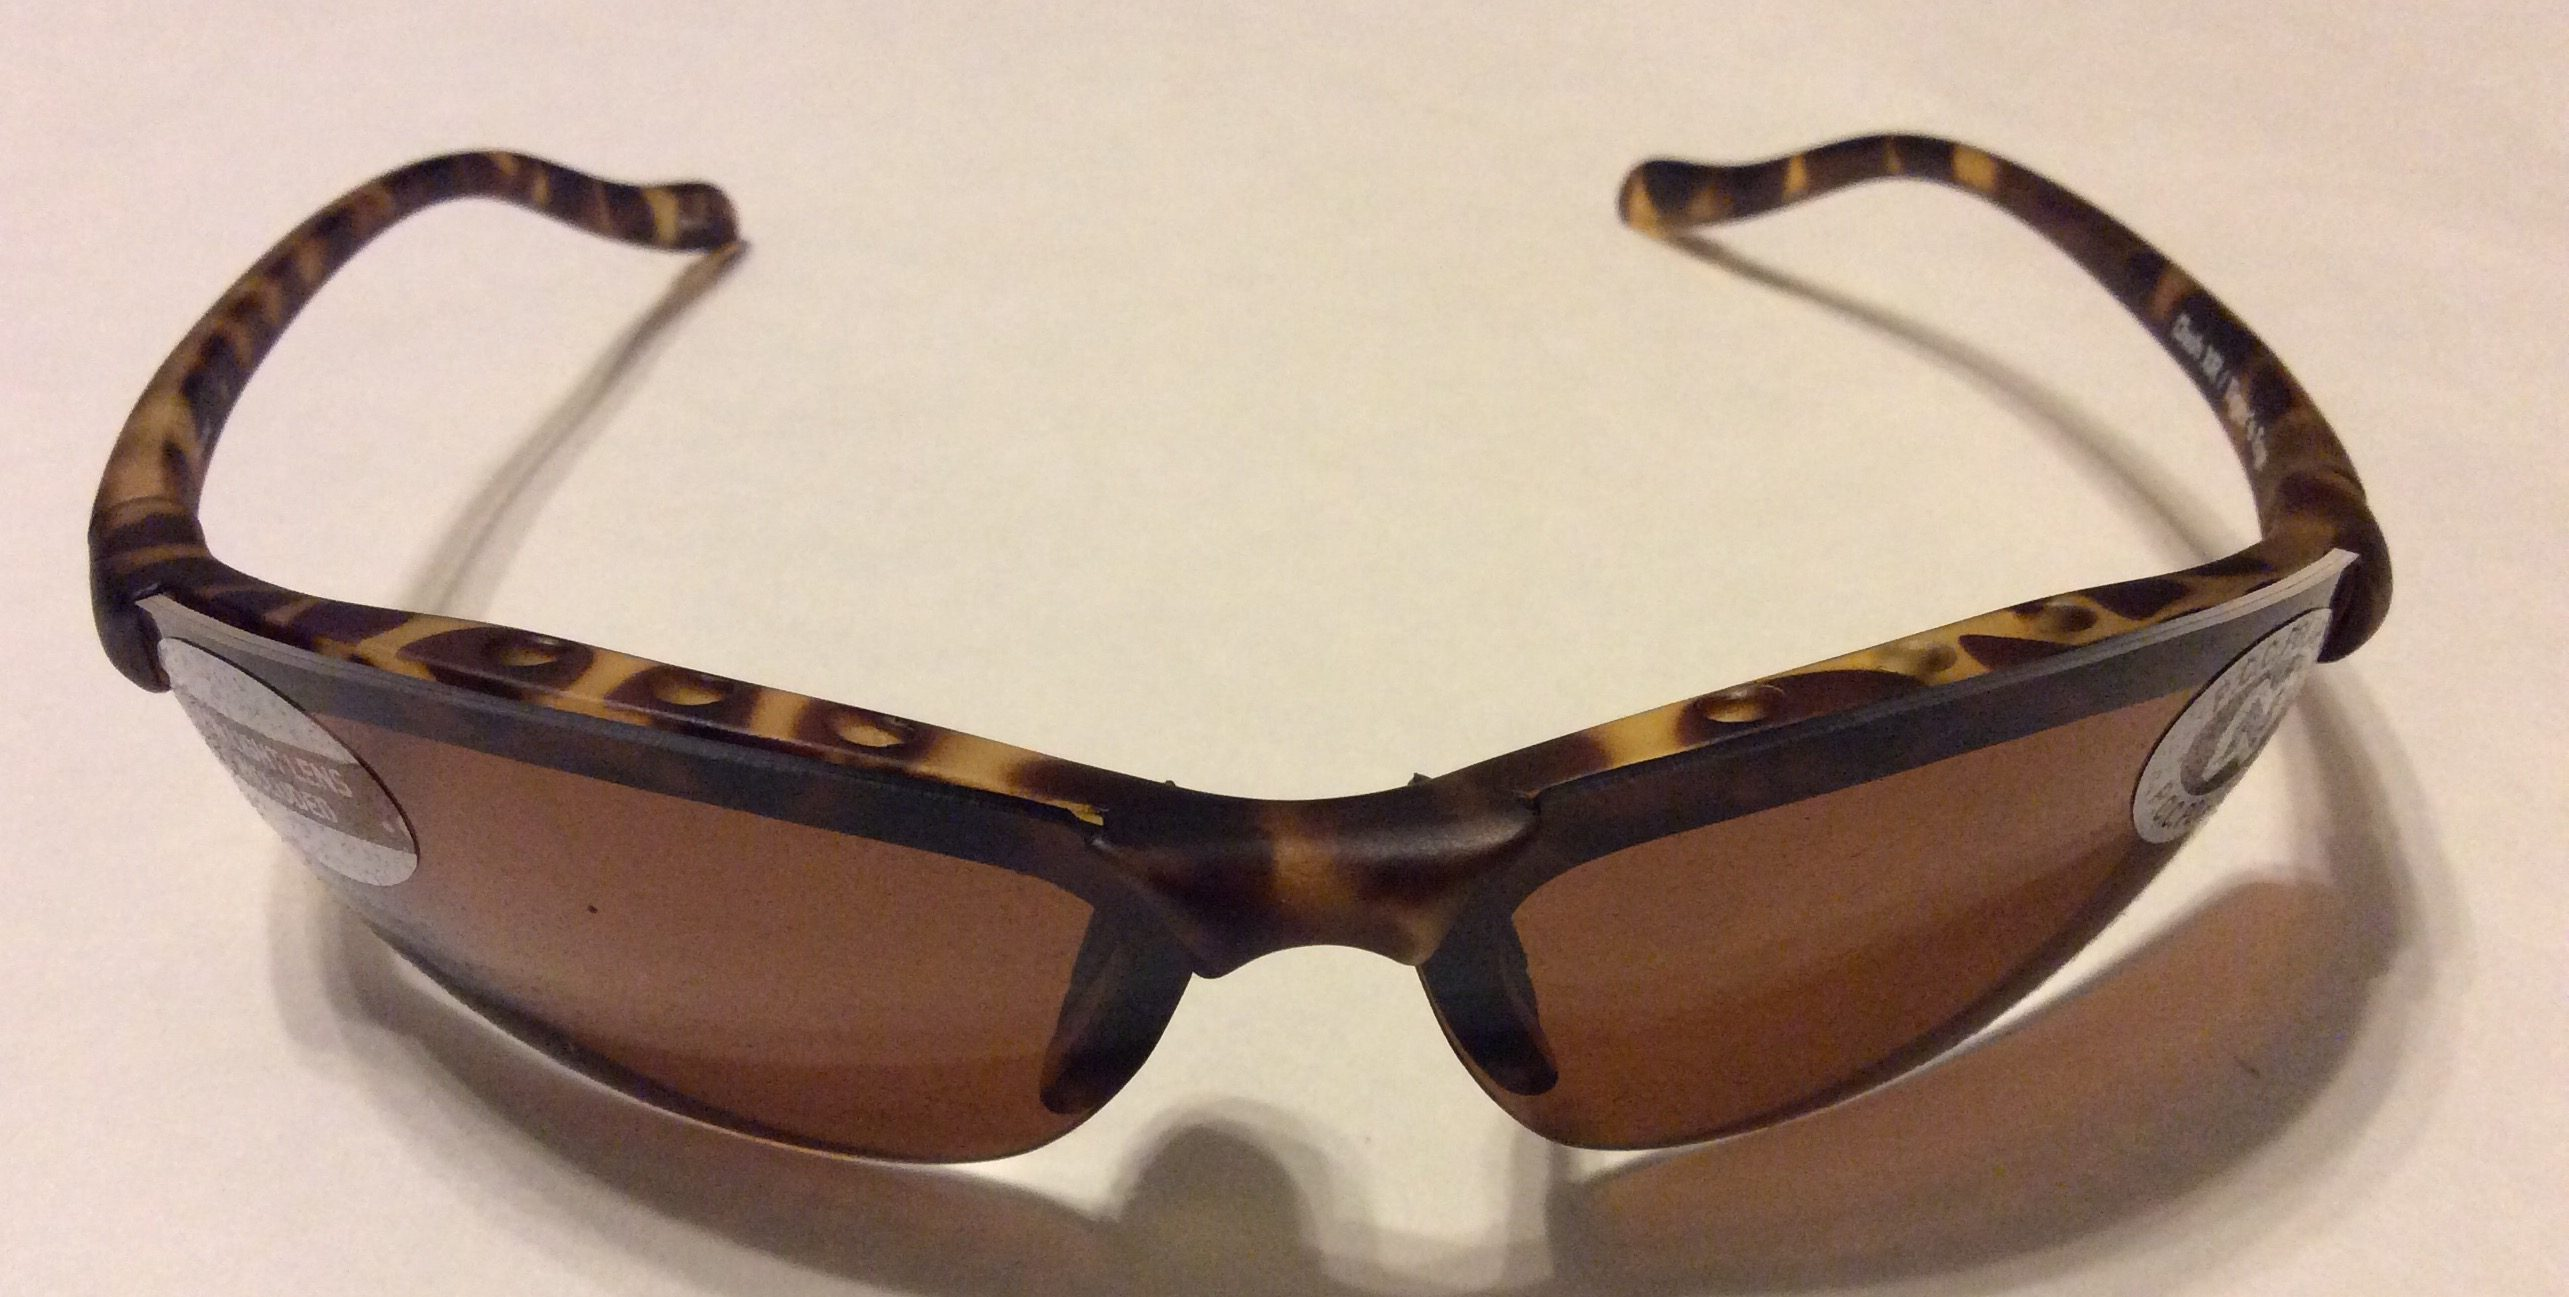 3989f9d8d1 Native Eyewear Dash XR Sunglasses w  Extra Lenses – Tiger s Eye – Polarized  Brown